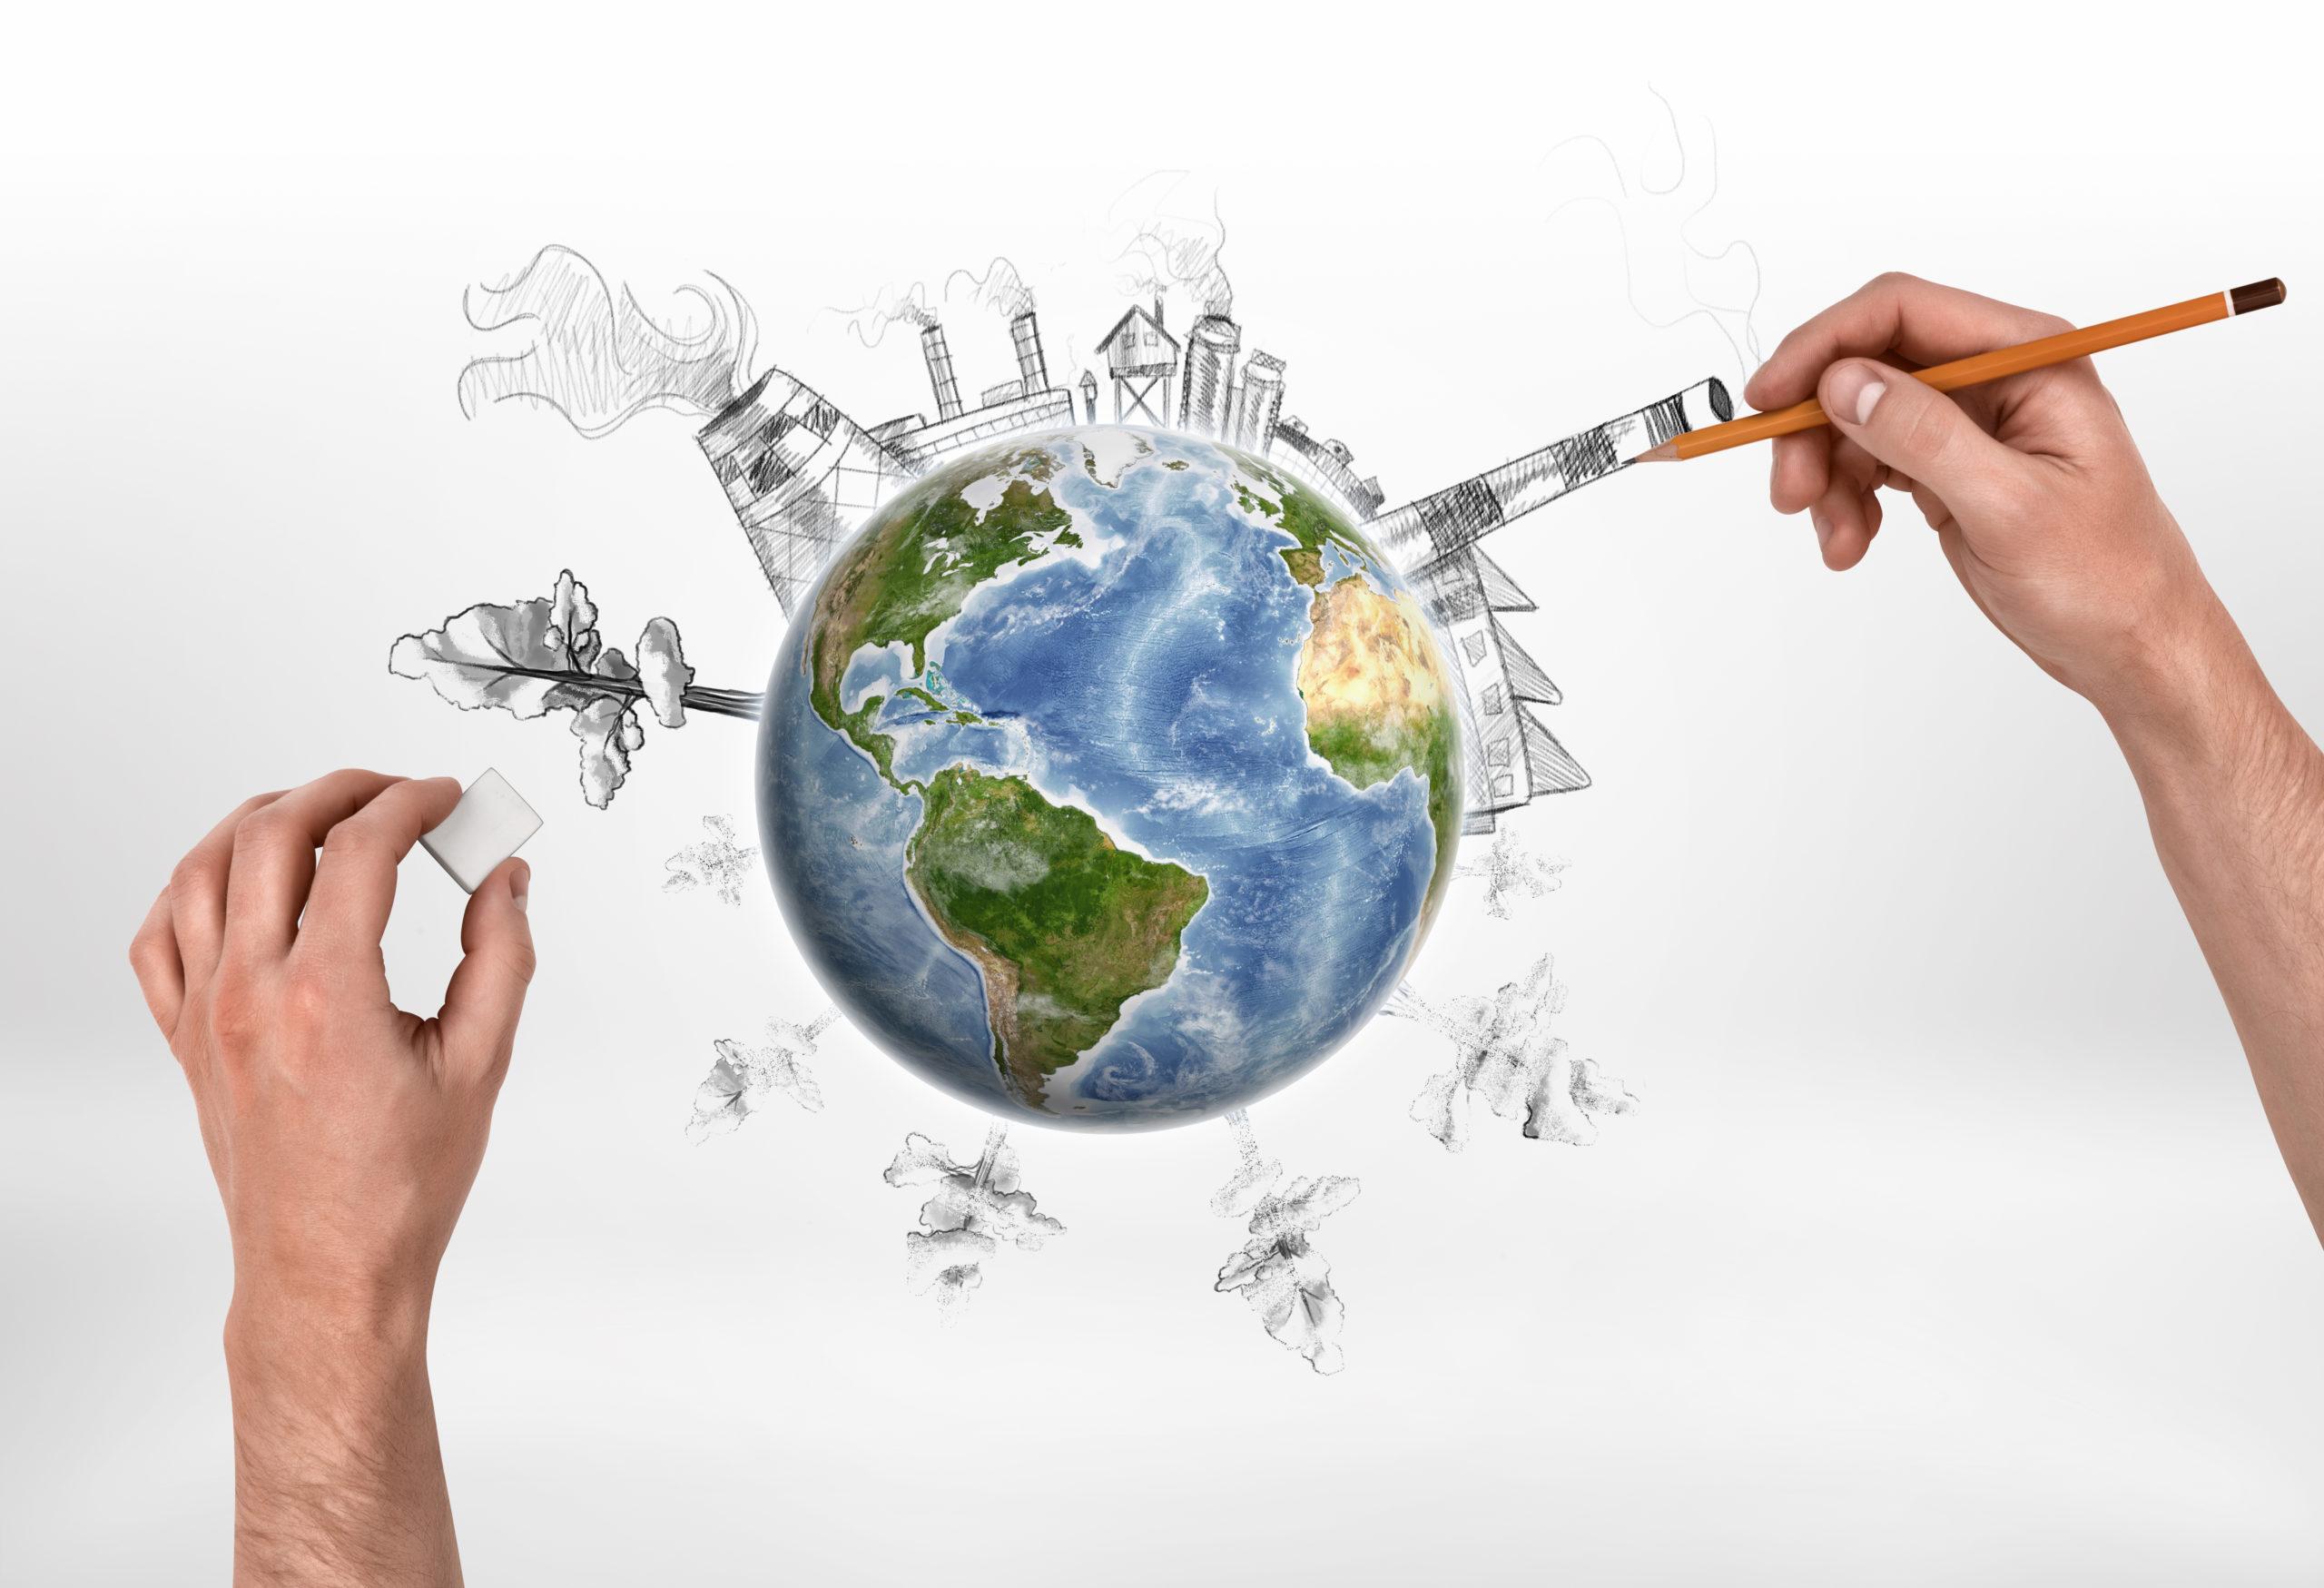 Taskforce shares 20 recommendations to improve stewardship